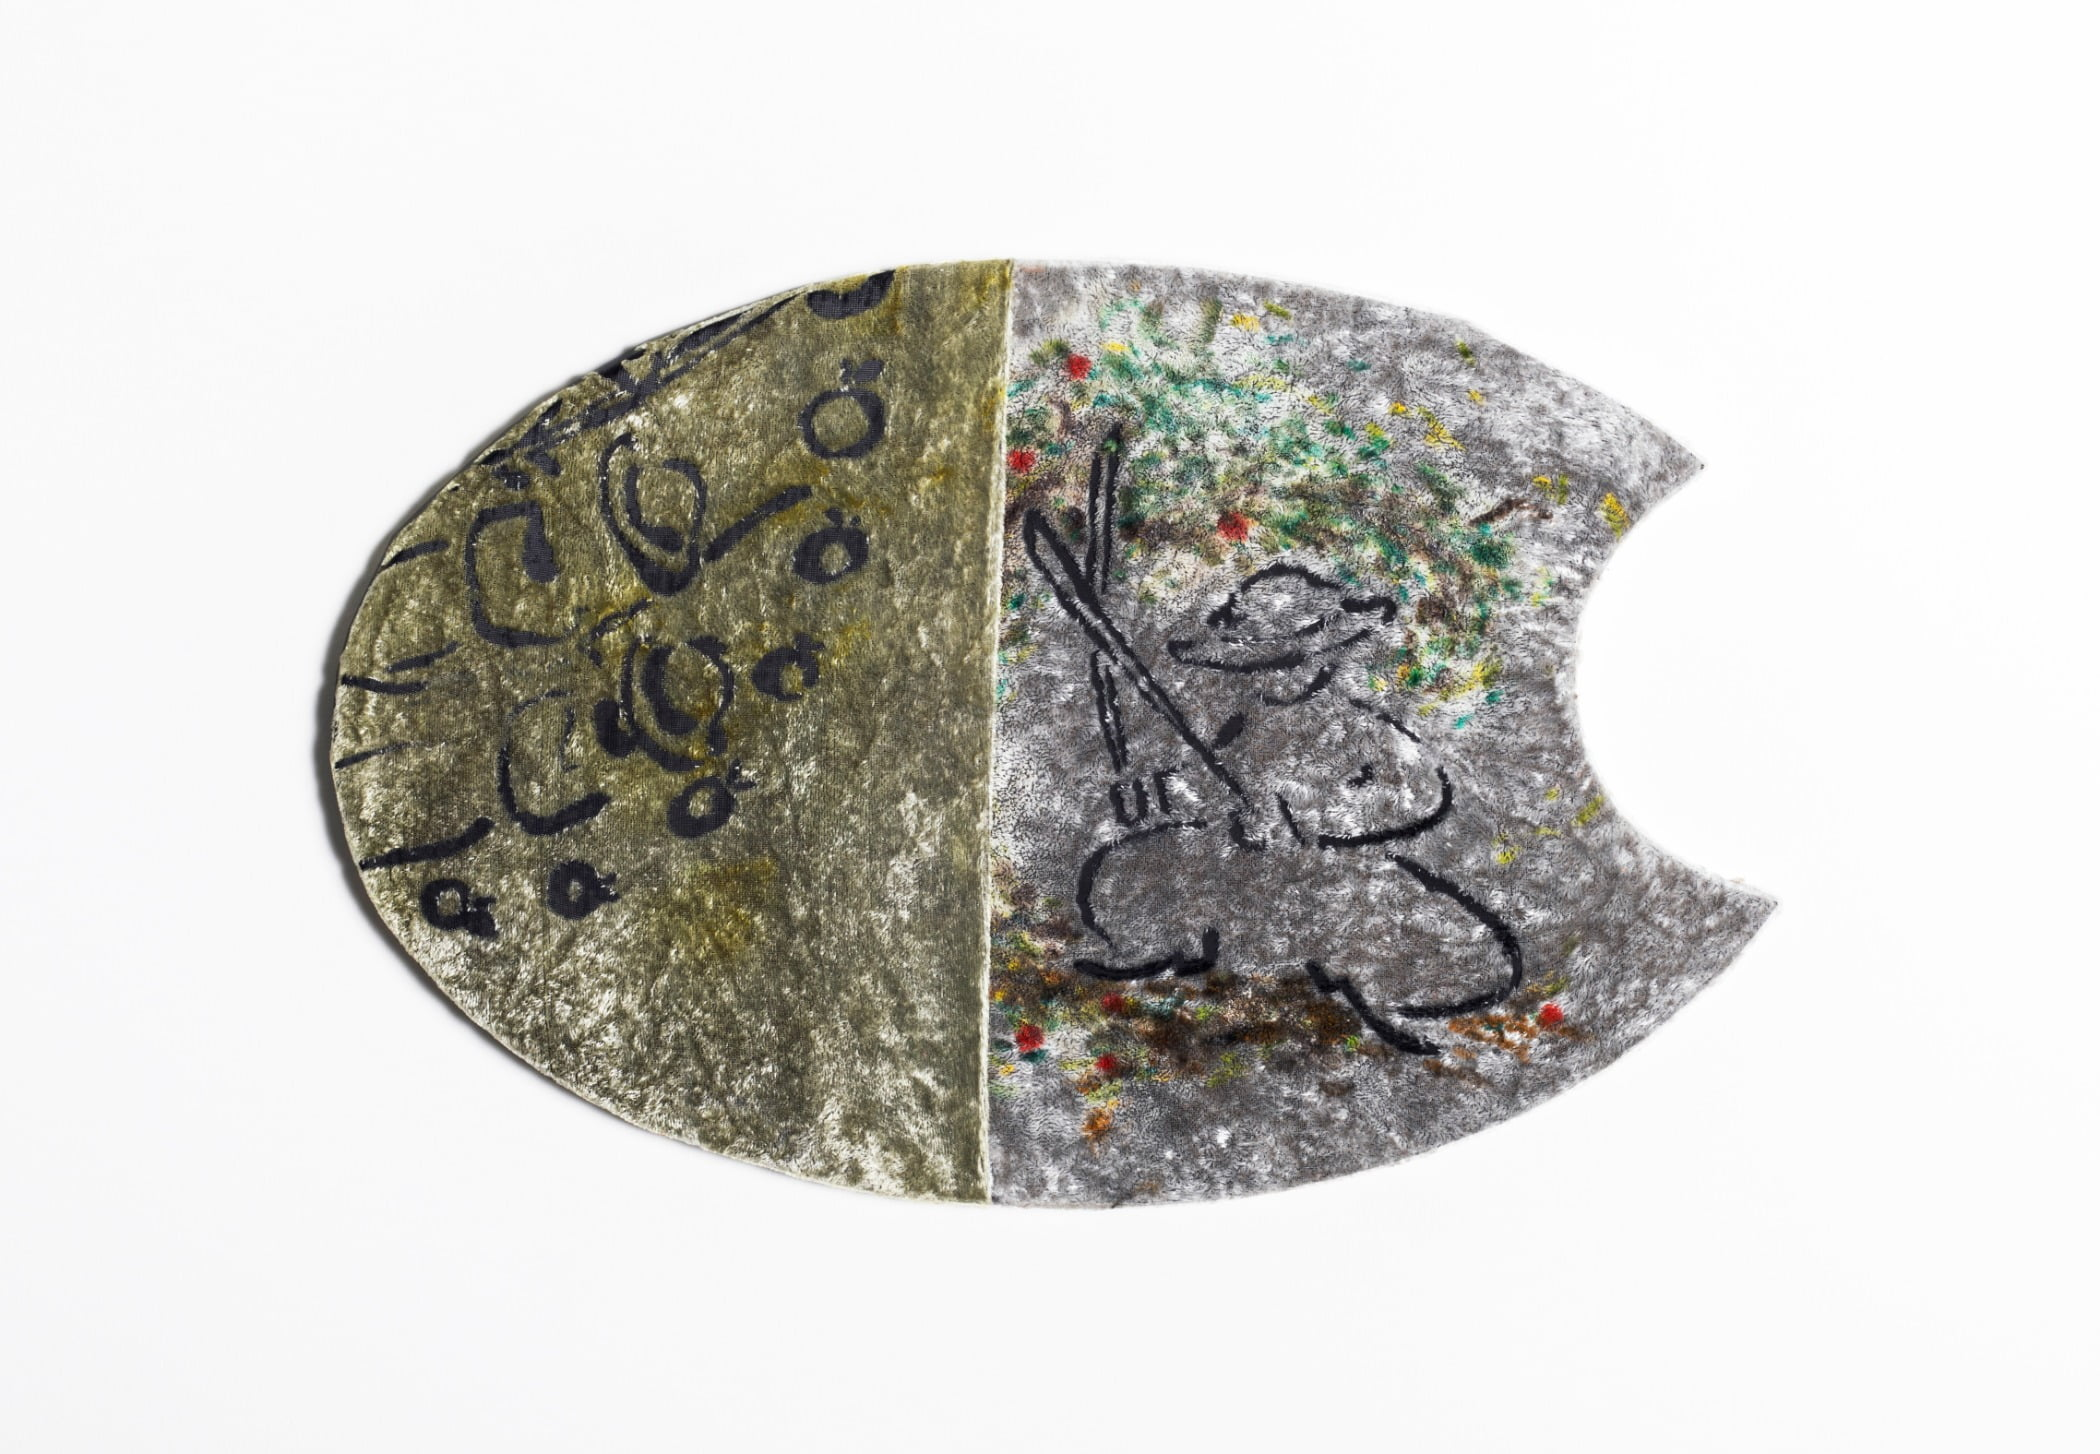 Sleeve, Plant, Artifact